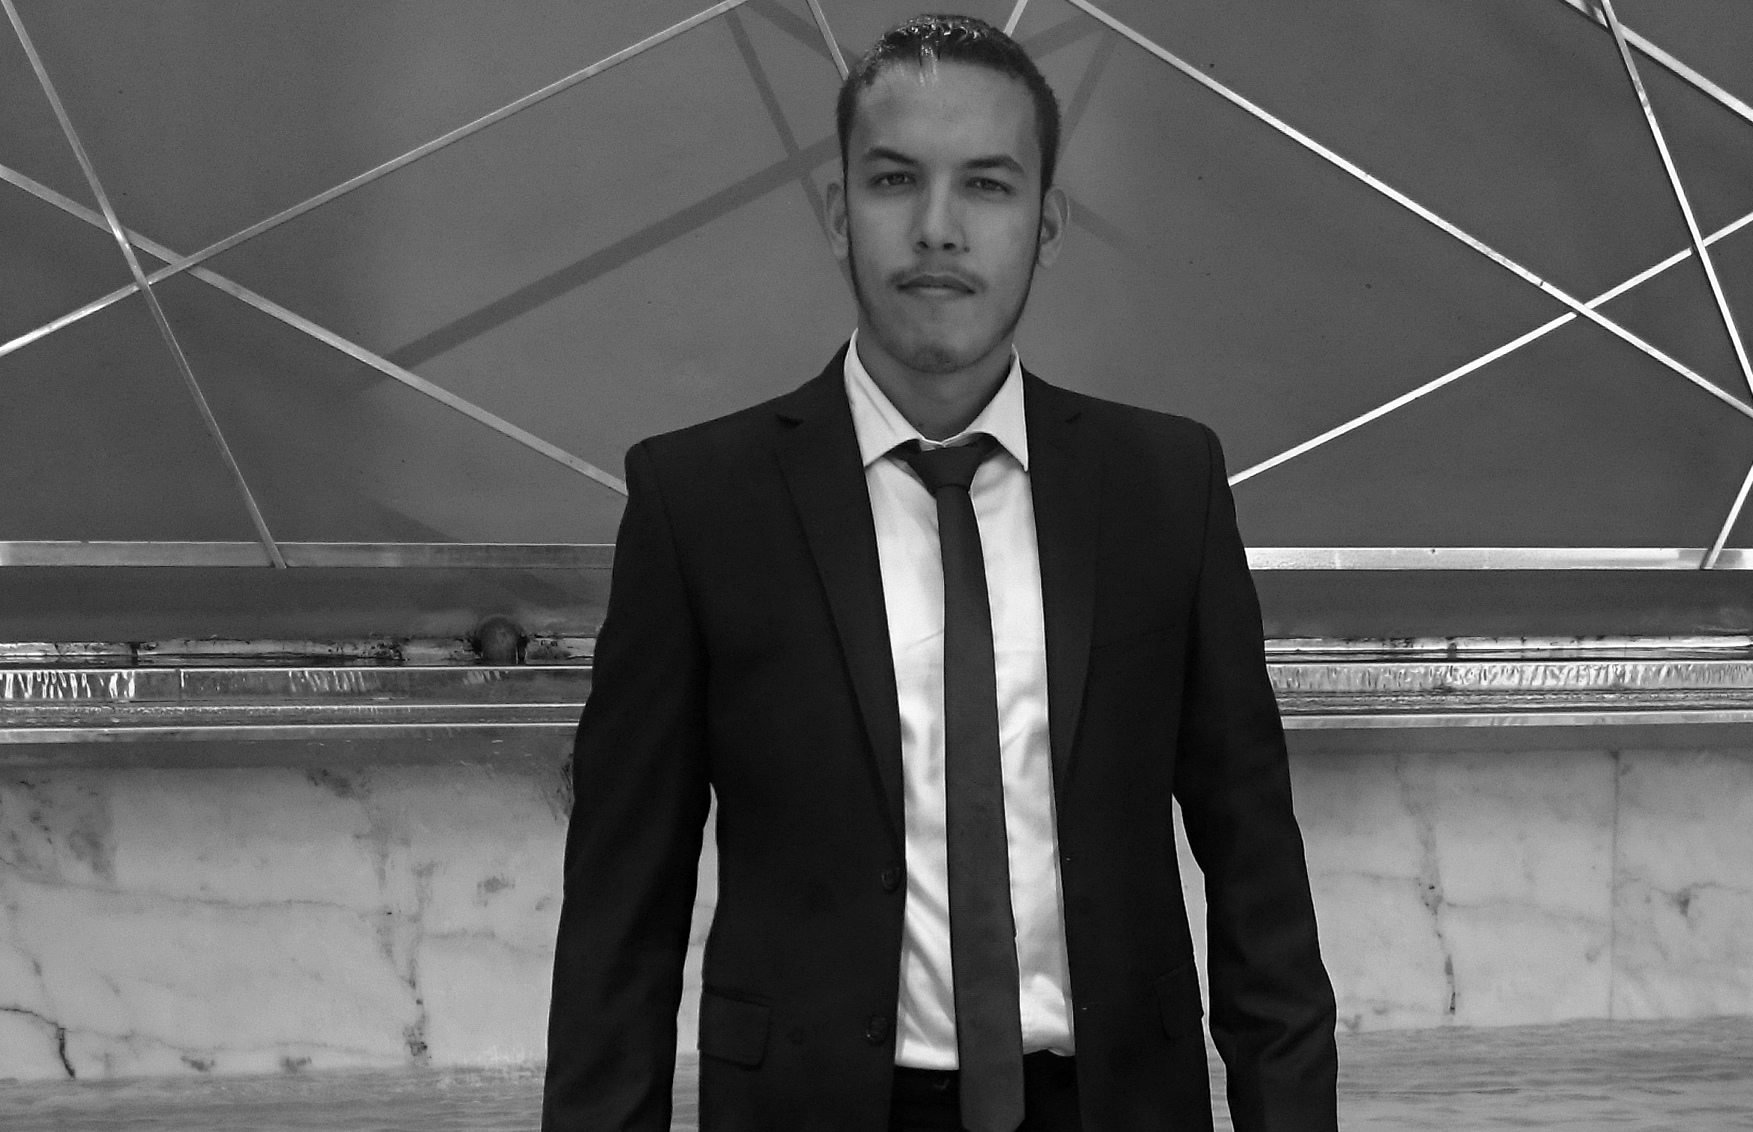 Ayoub Rouzi, CEO, Khdemti.com